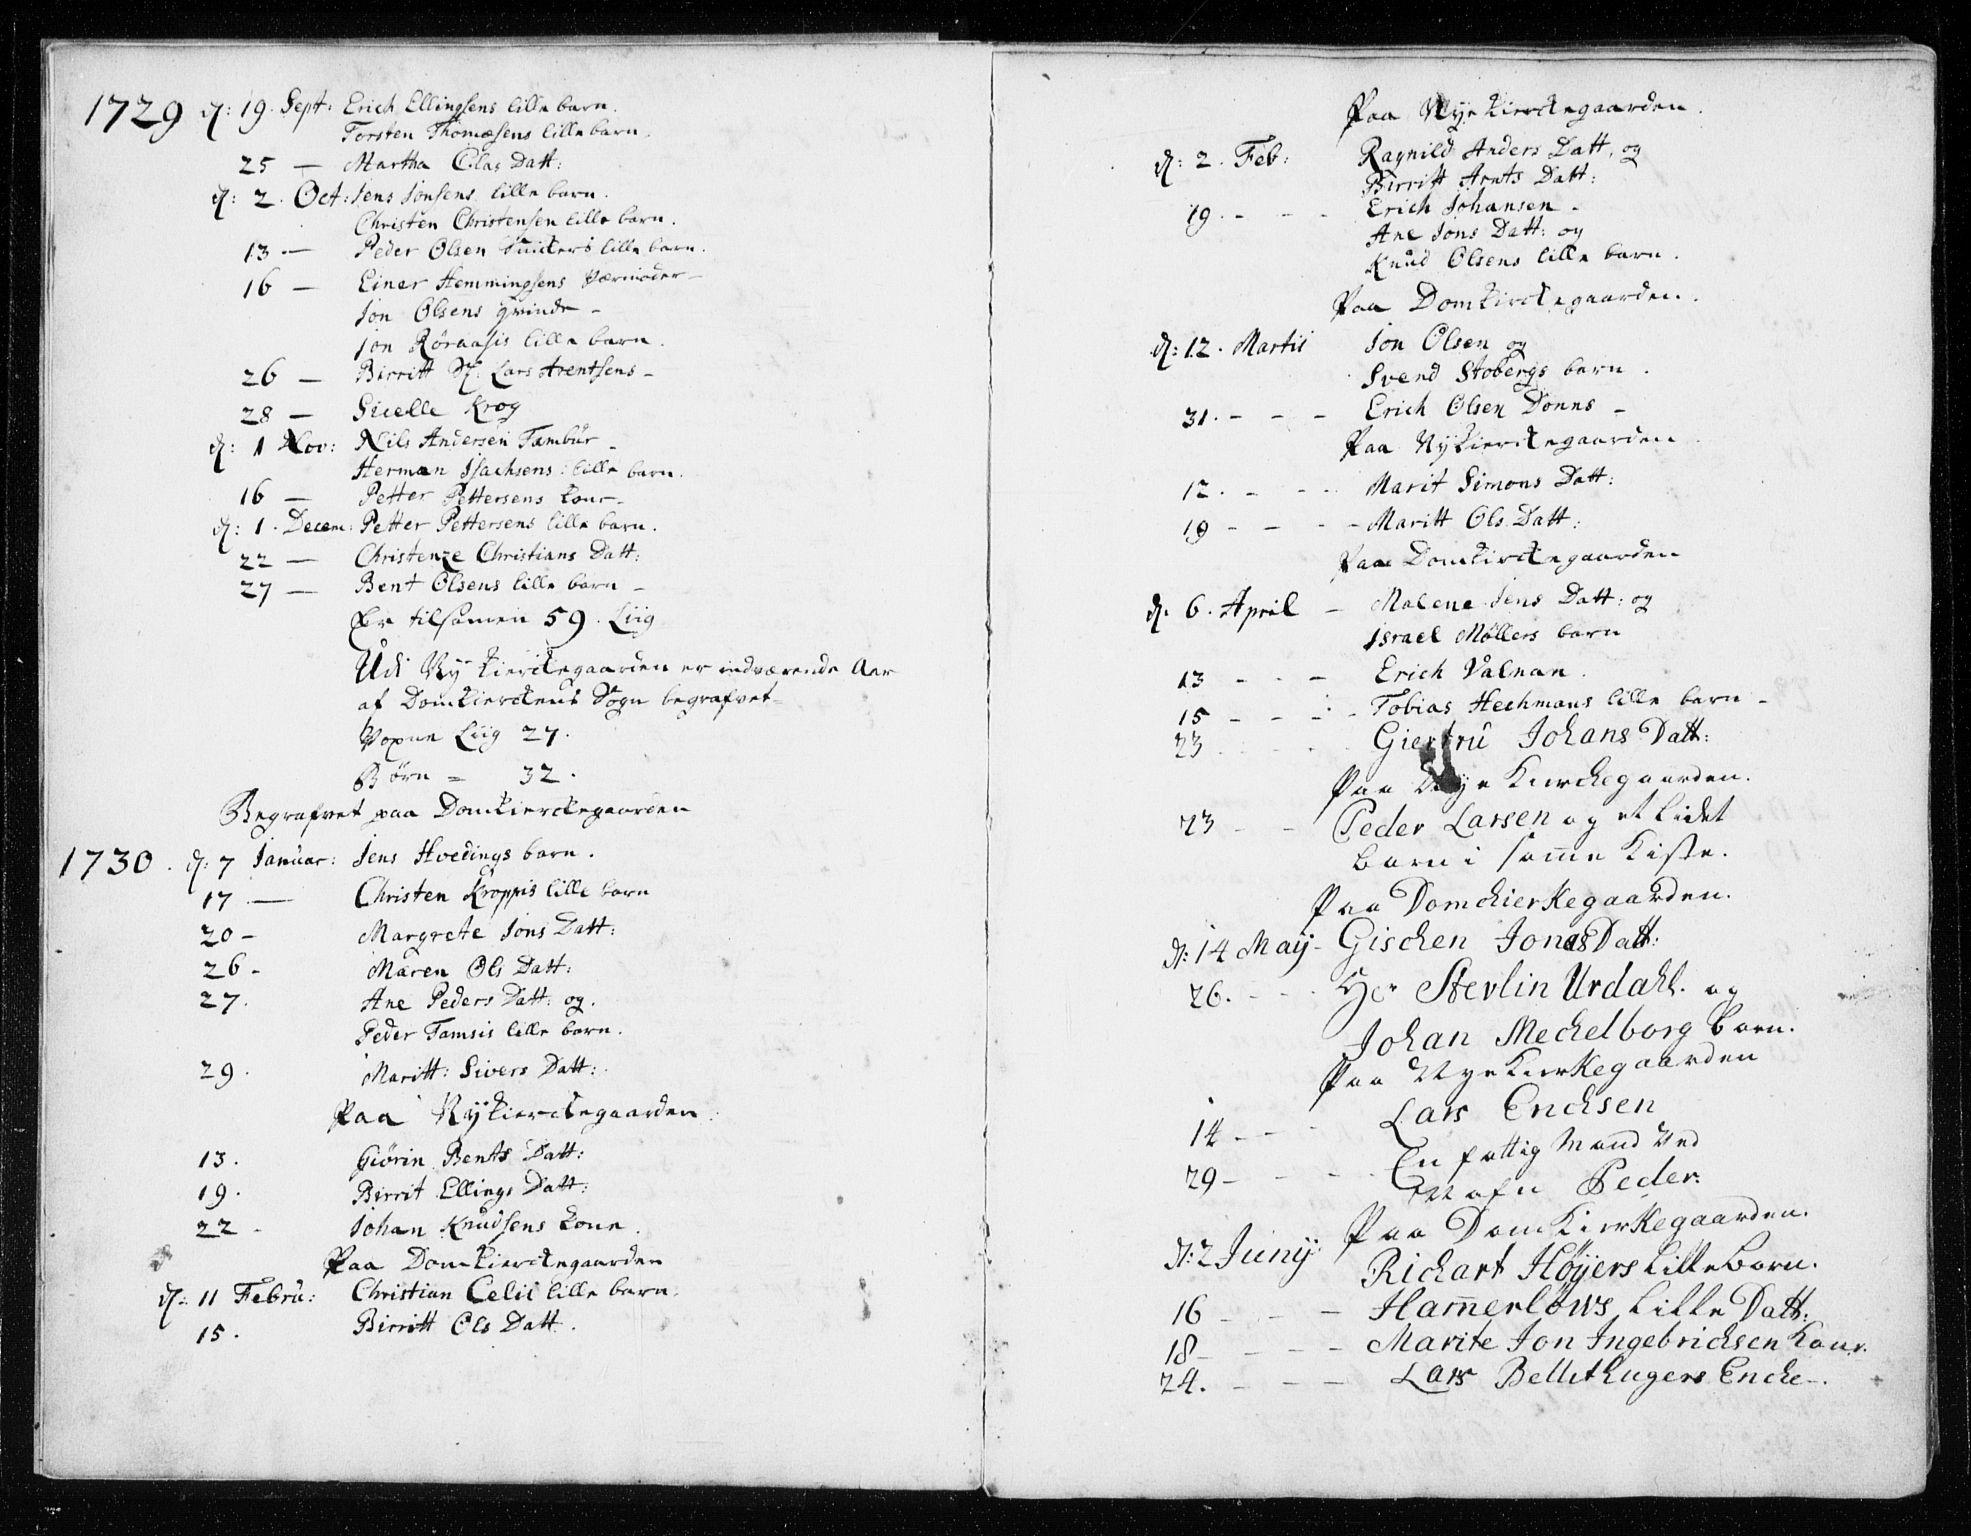 SAT, Ministerialprotokoller, klokkerbøker og fødselsregistre - Sør-Trøndelag, 601/L0037: Parish register (official) no. 601A05, 1729-1761, p. 2